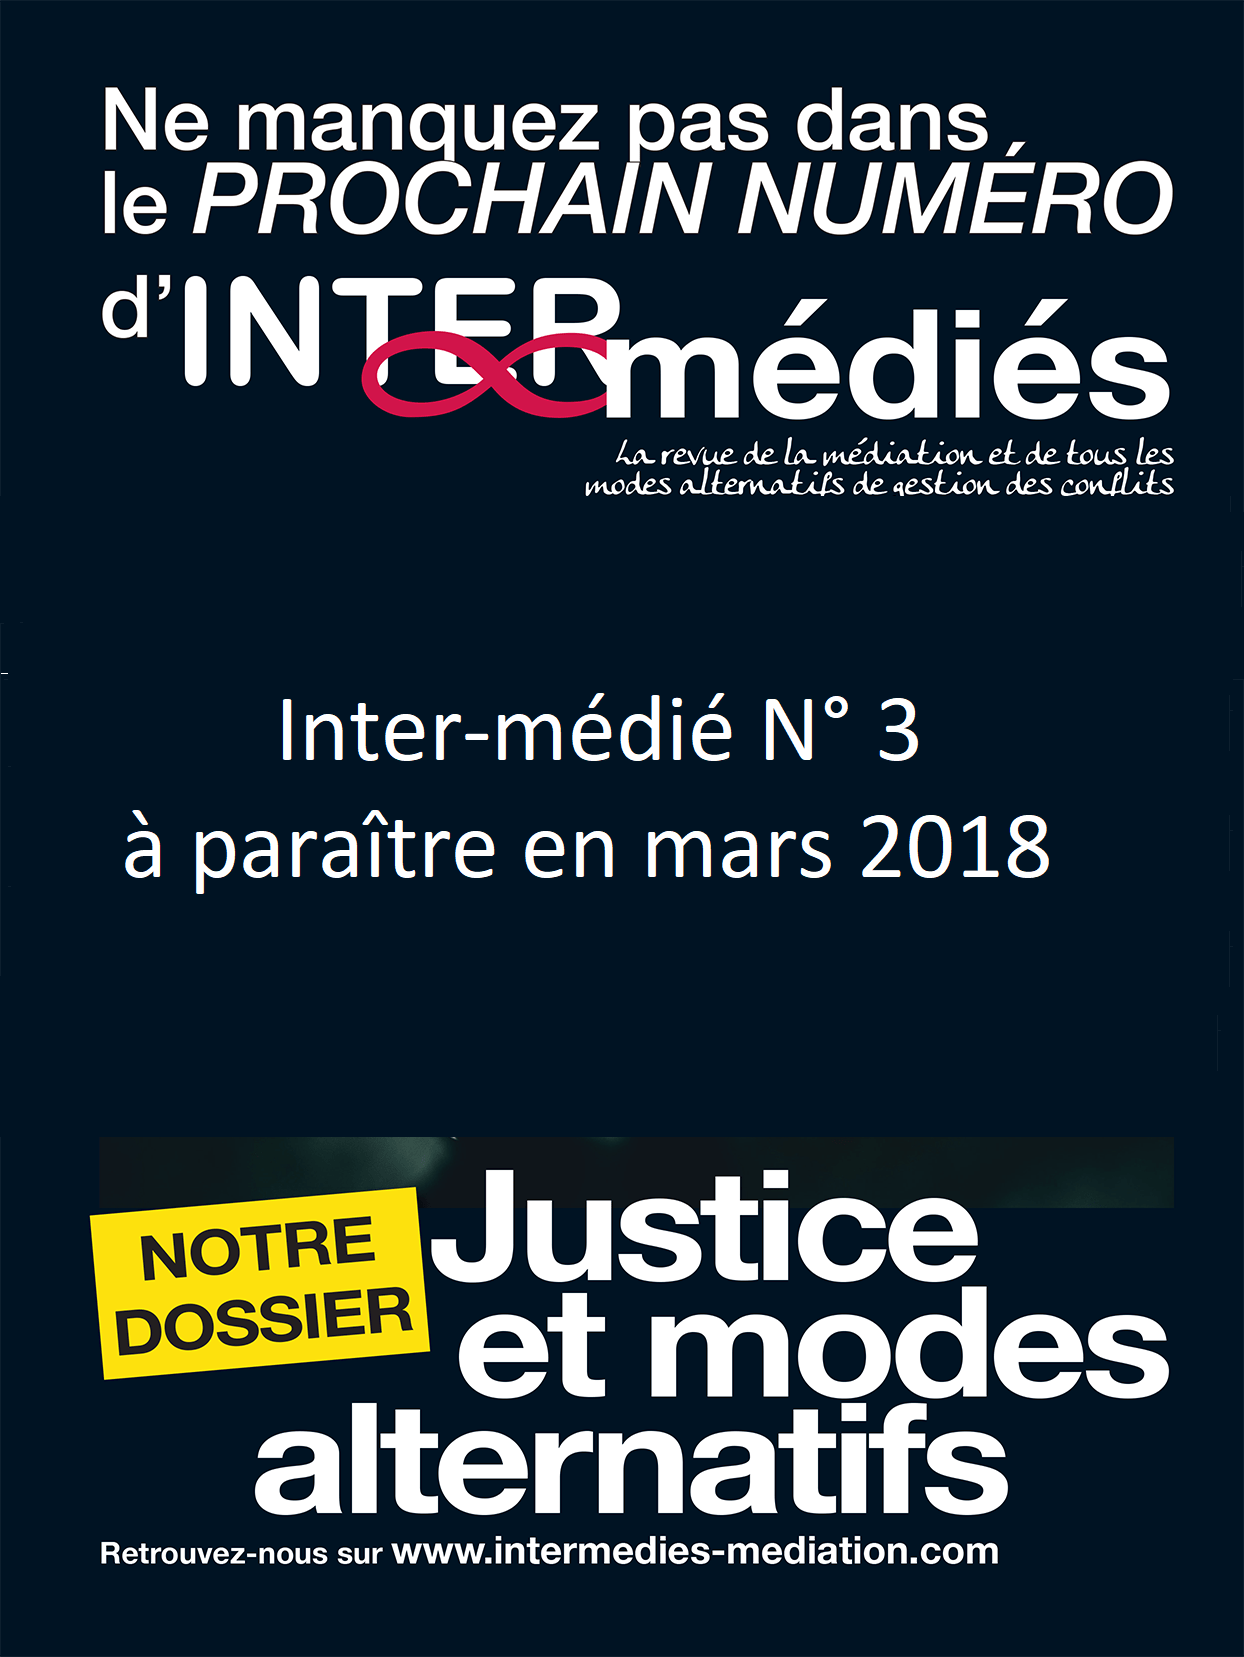 INTER-médiés, inter-medies, intermédiés, intermedies,